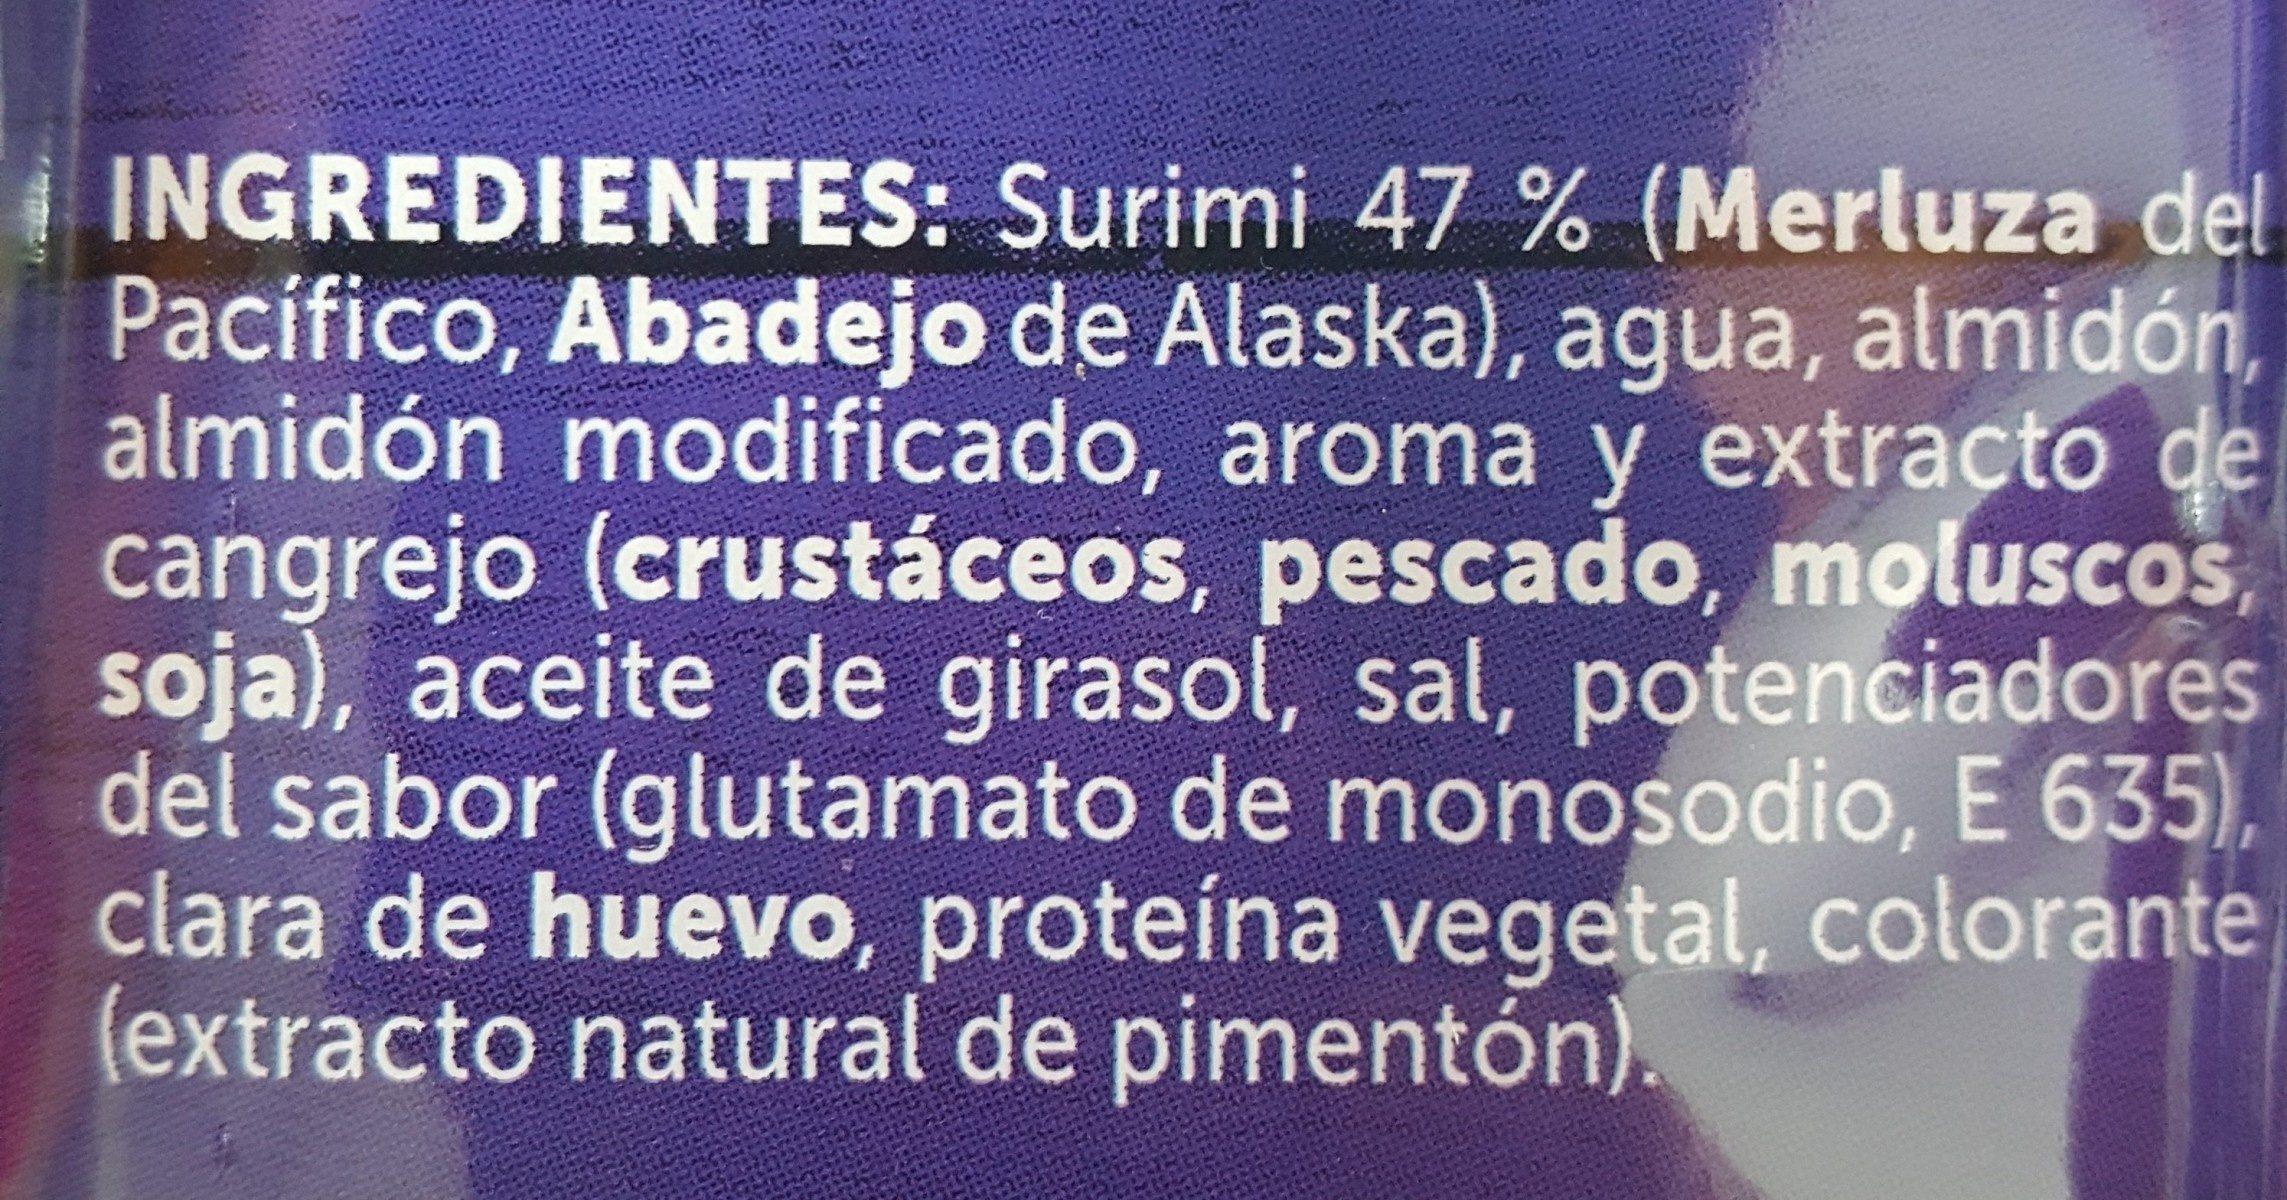 Palitos de Surimi - Ingrédients